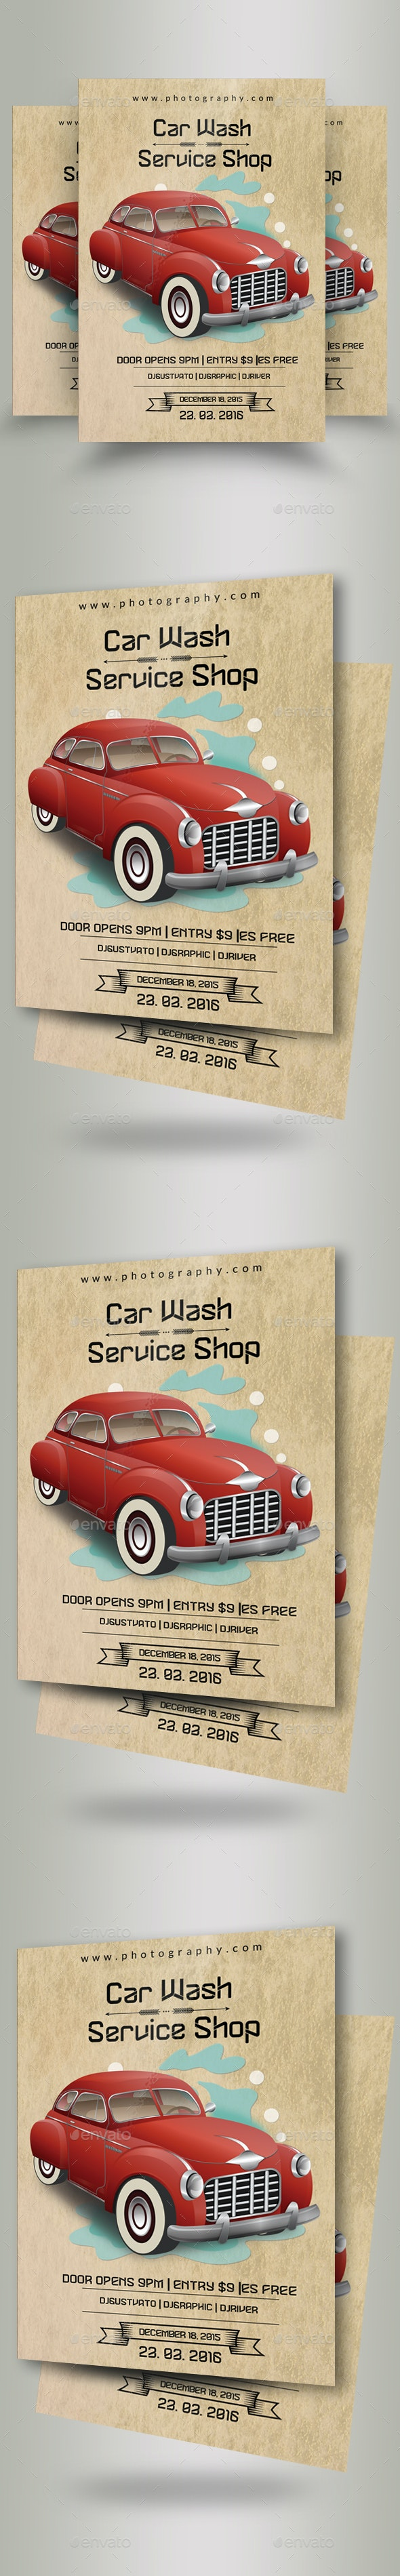 Vintage Car Wash Flyers - Flyers Print Templates